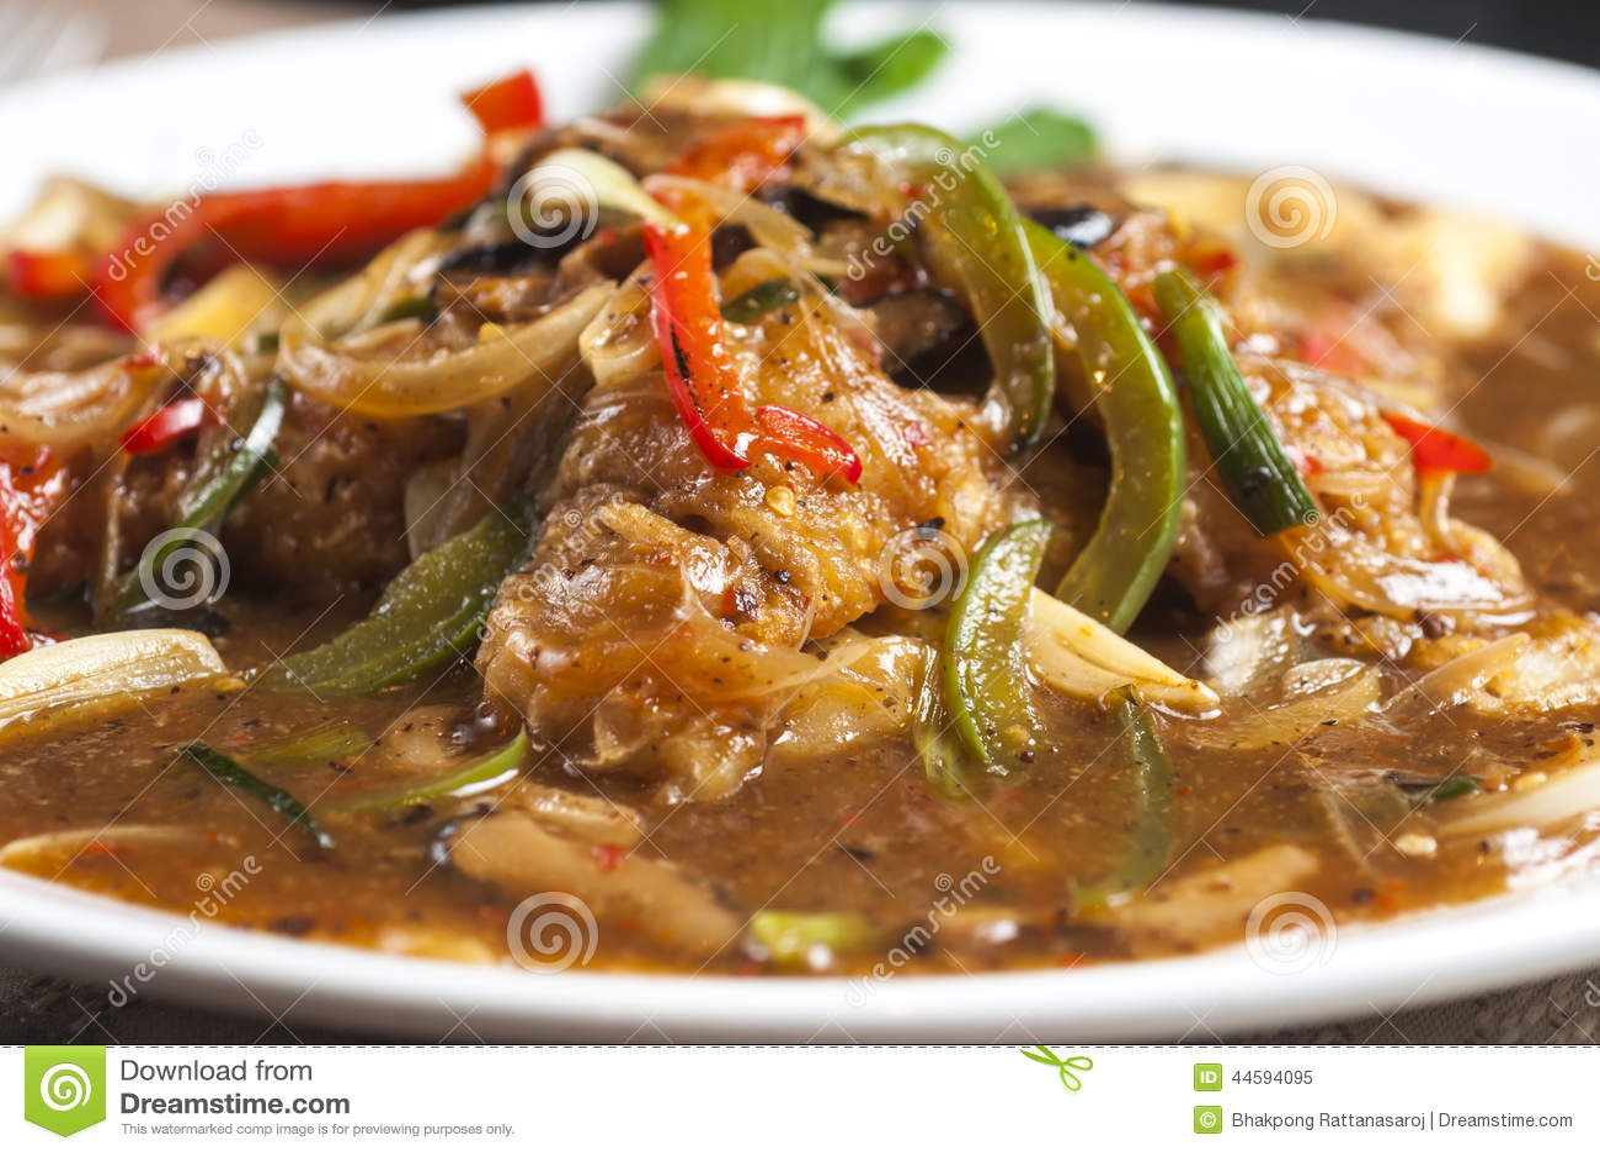 Stir-Fry Rice Noodles With Black Bean Sauce Stock Photo - Image ...